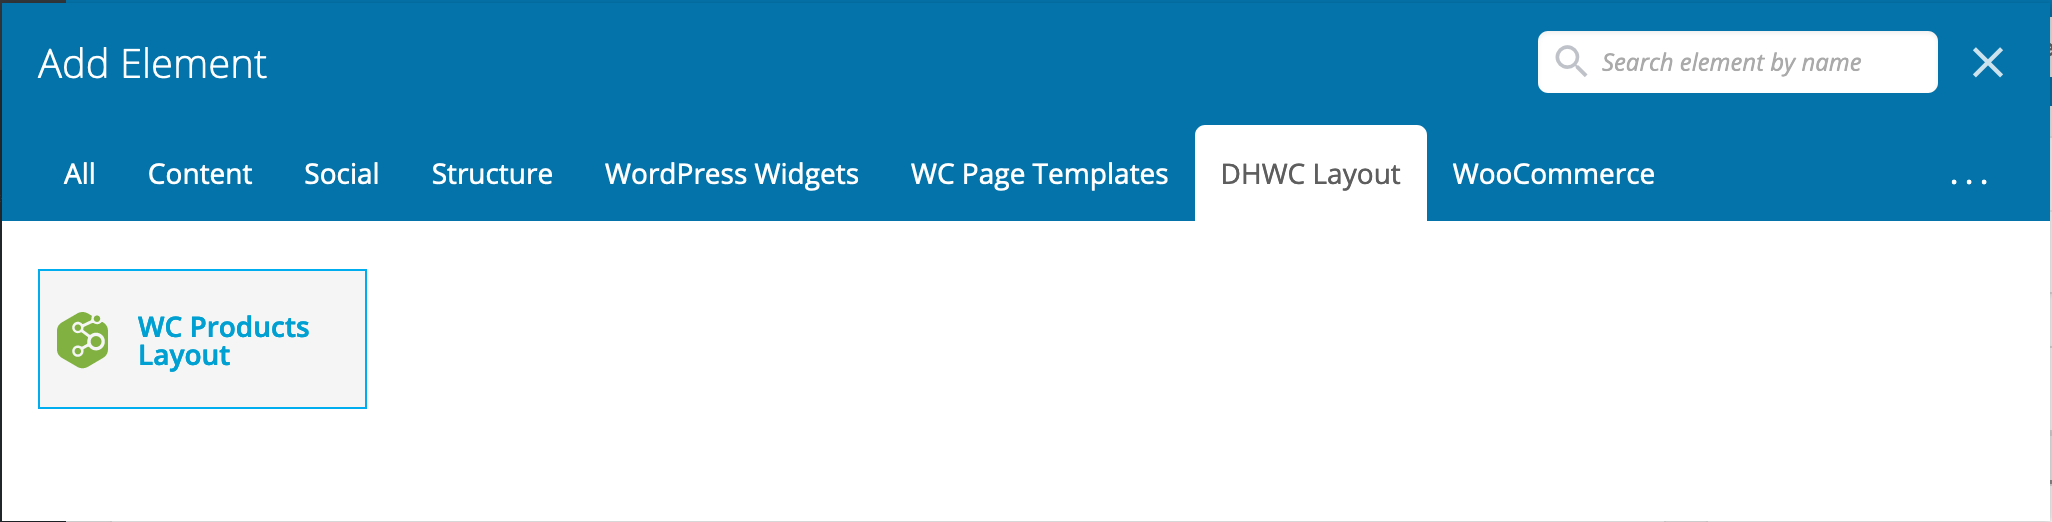 DHWCLayout - Layouts de produtos de comércio Woocommerce - 2